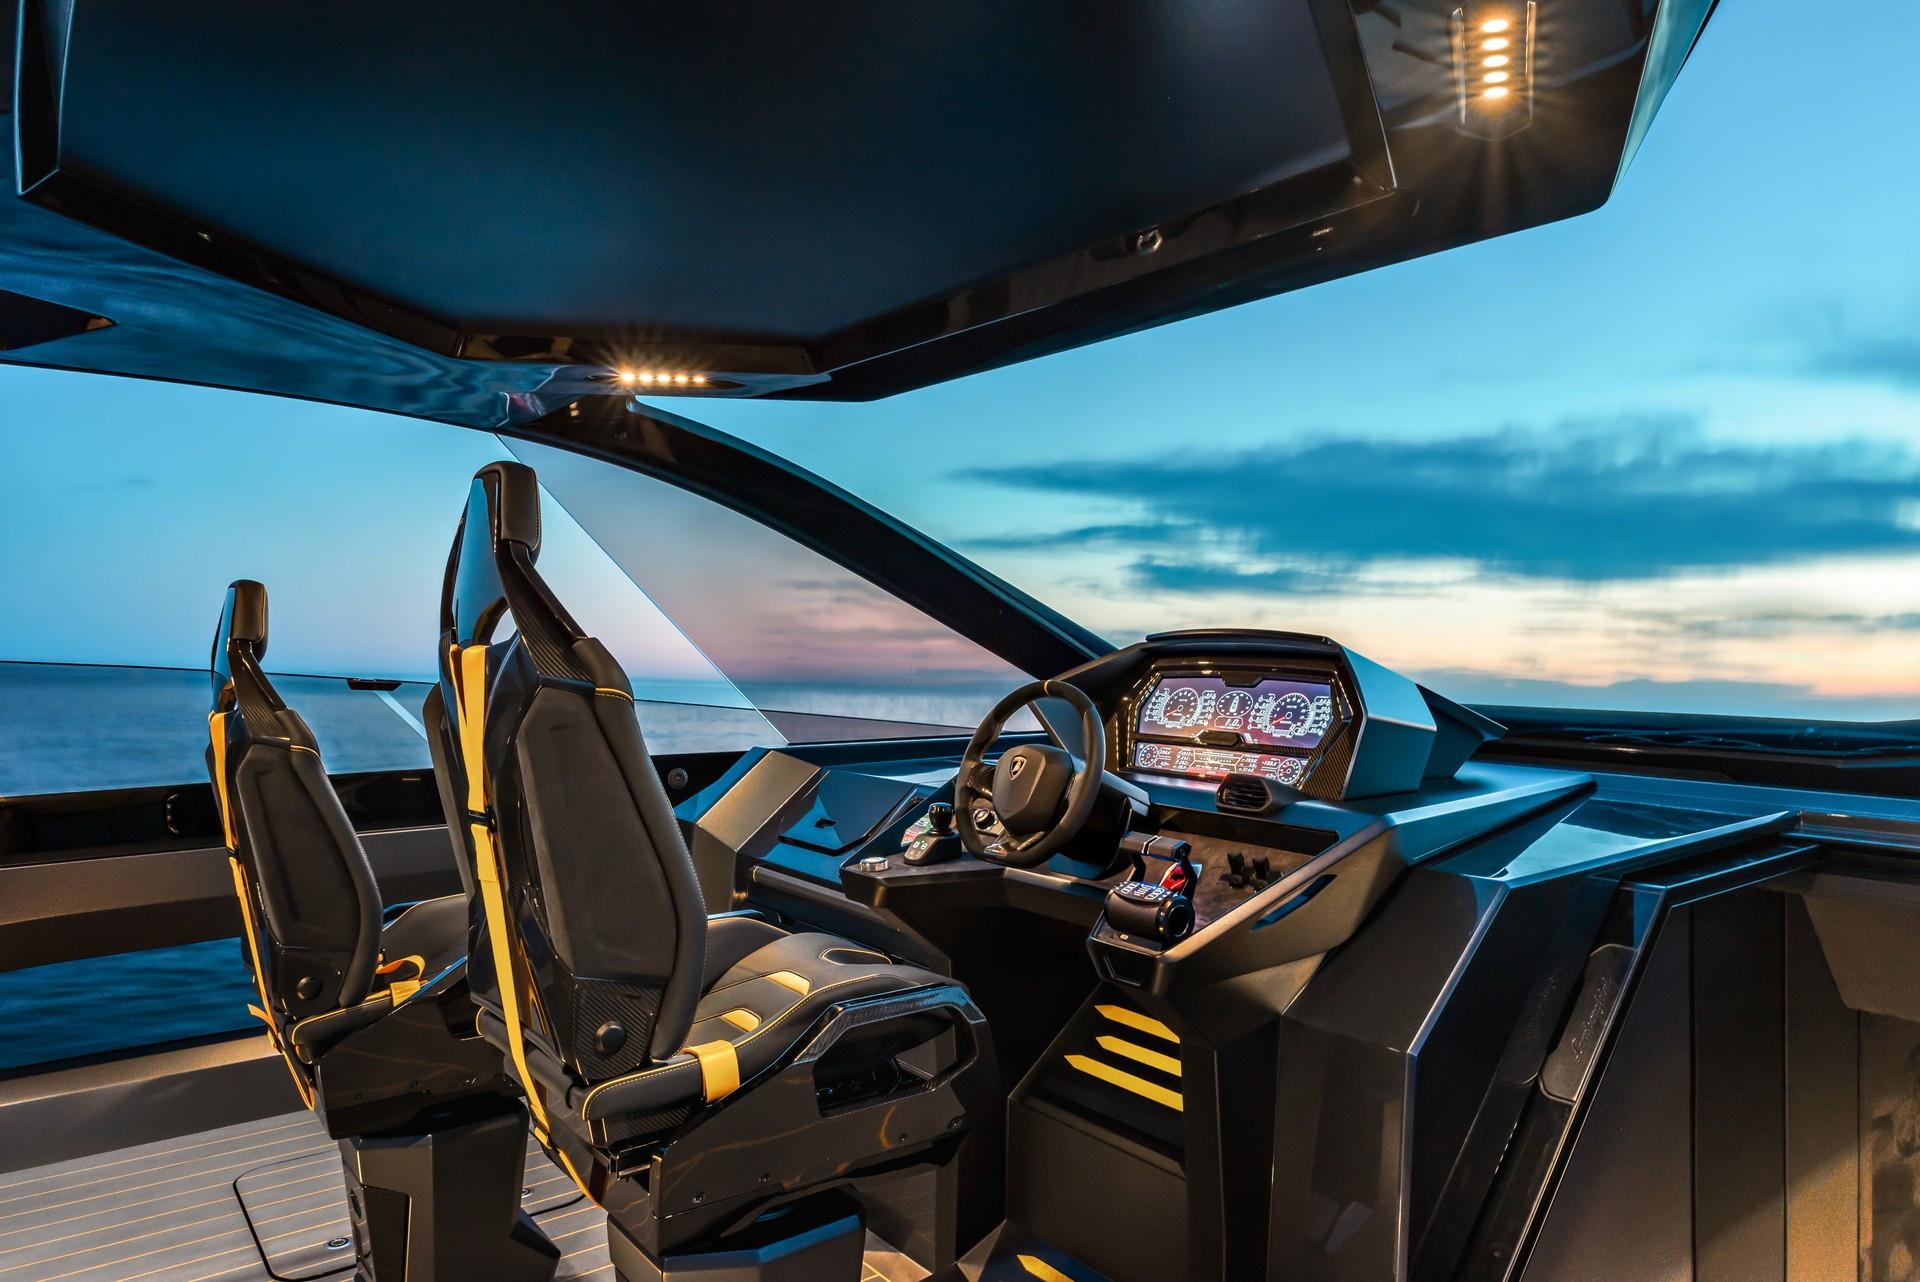 Cabin du thuyền Lamborghini Tecnomar